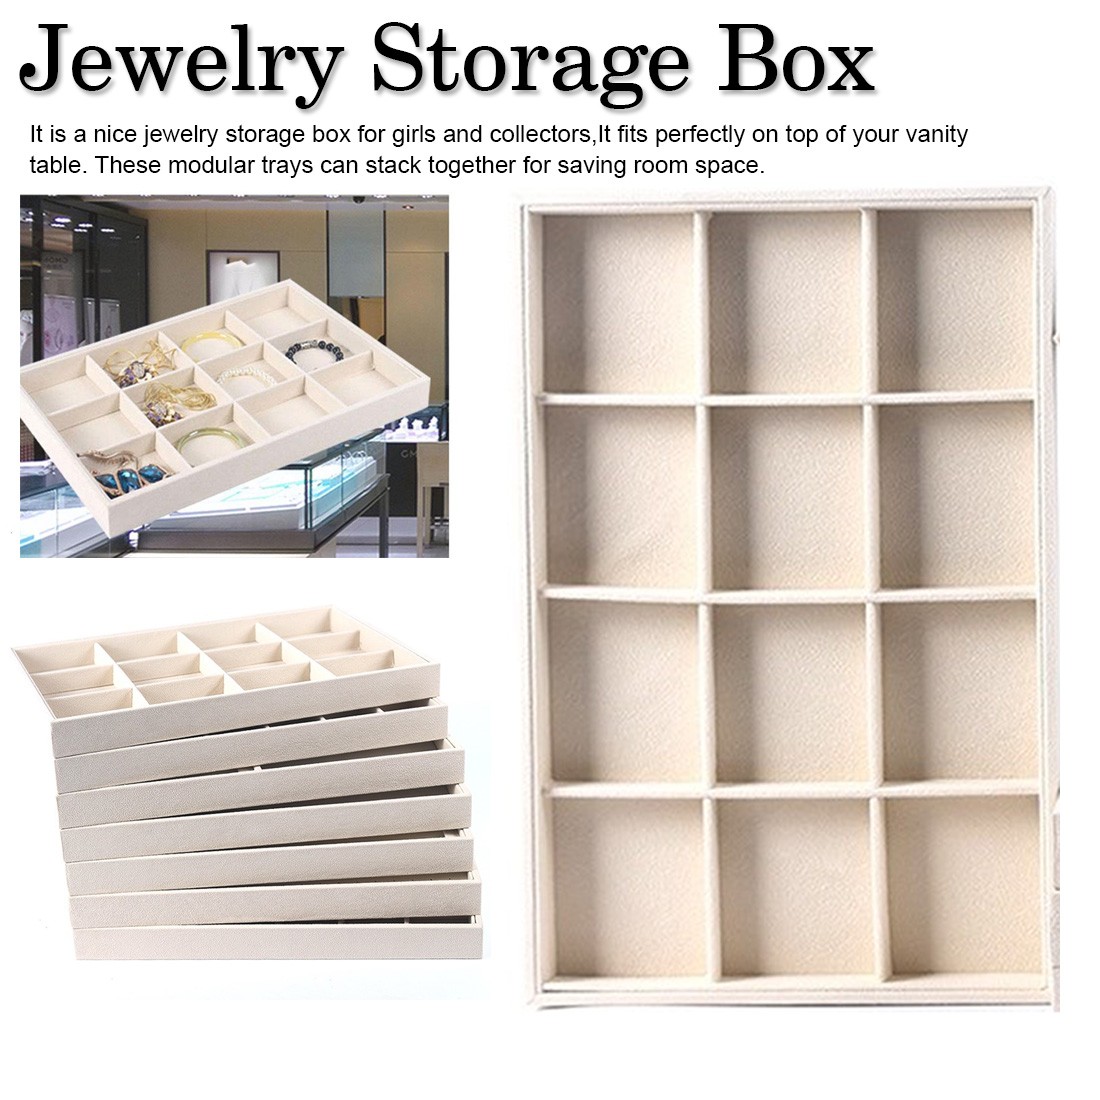 Ladies New Arrival DIY Jewelry Box Drawer Storage Organizer Soft Jewelery Earring Necklace Pendant Bracelet Tray